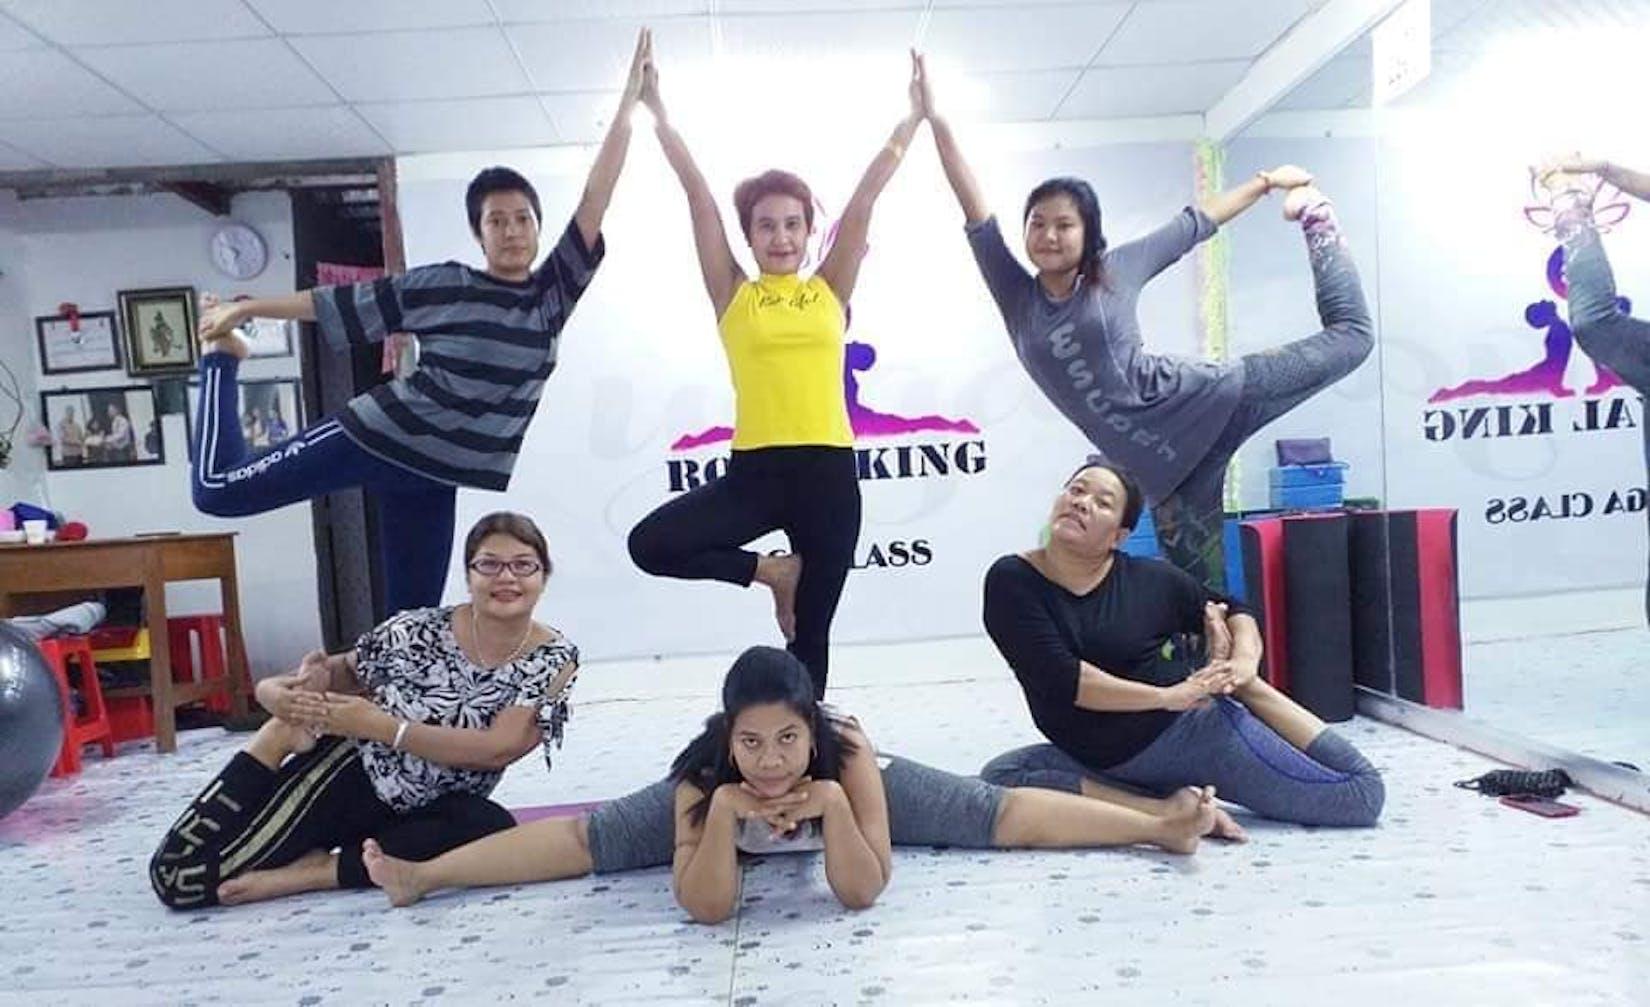 Royal King Yoga Class | Beauty